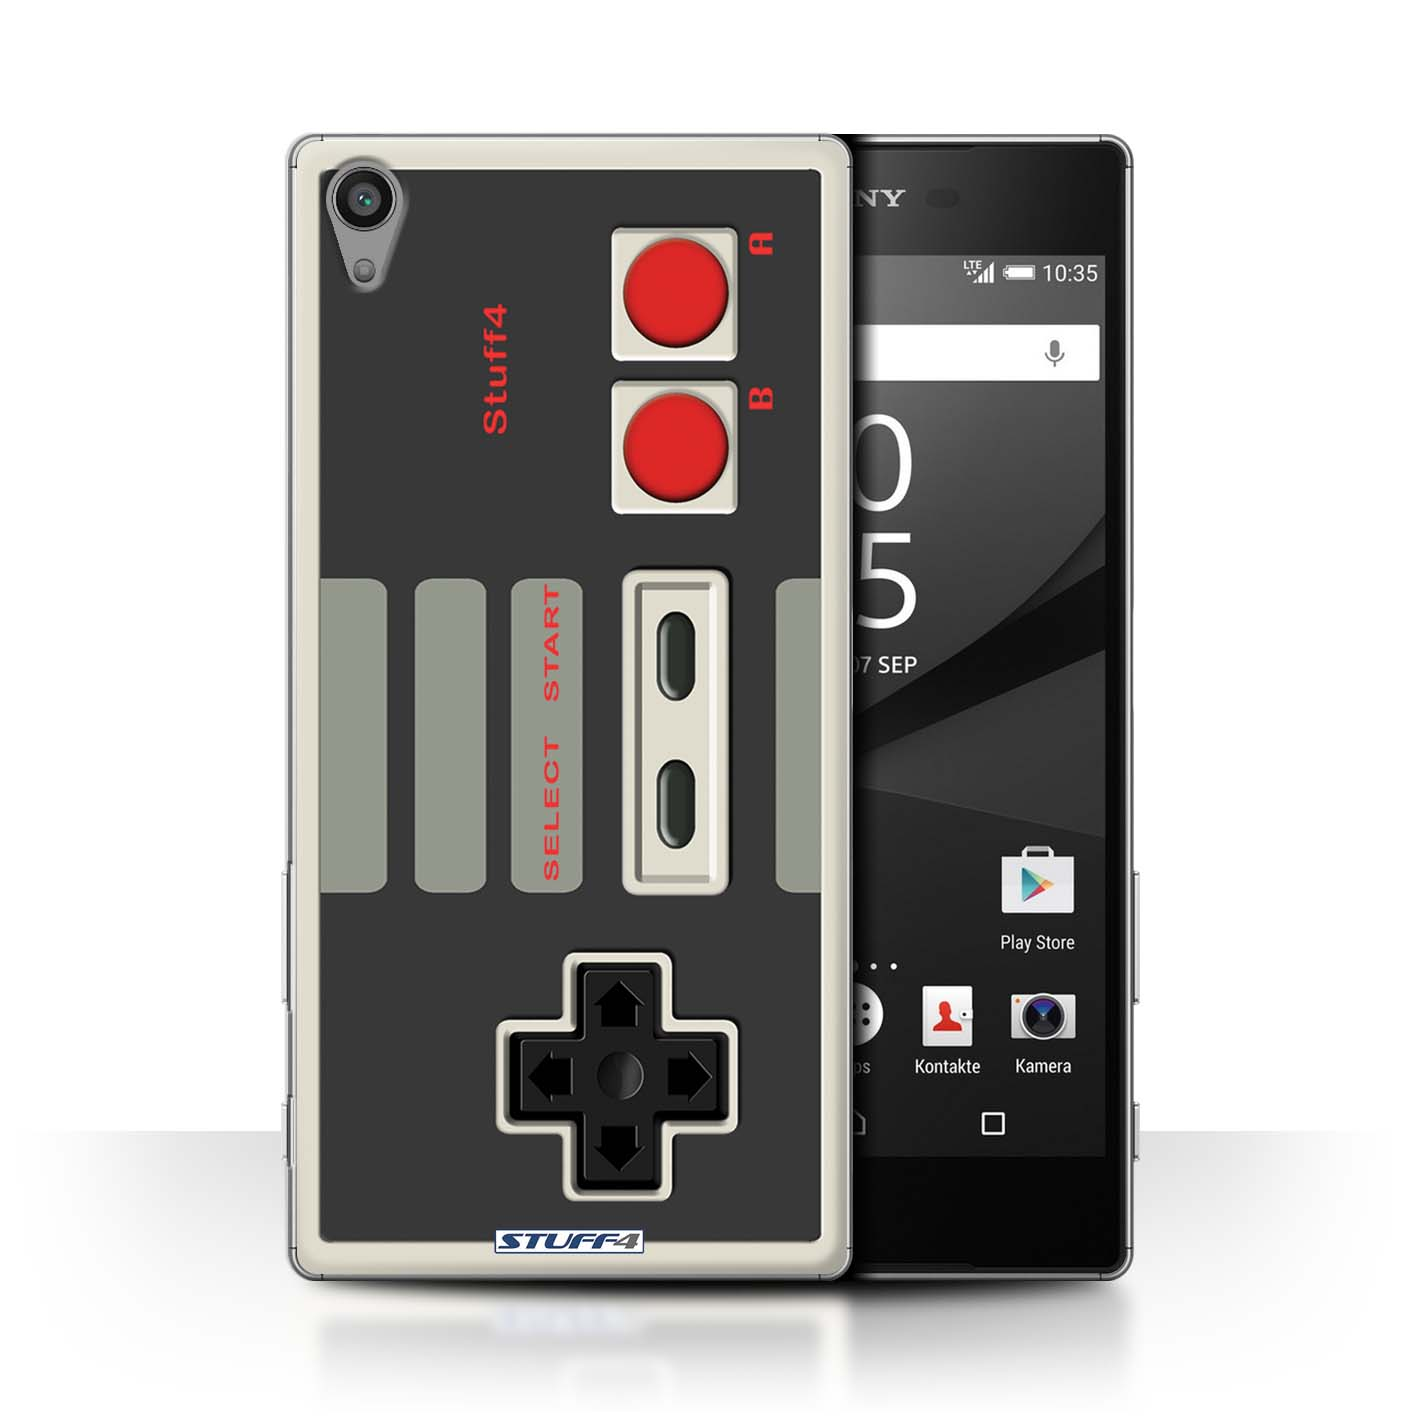 Nintendo Classic Games Console Design For Sony Xperia Z5 Premium 55 Miro St23i 4 Gb Click To Zoom